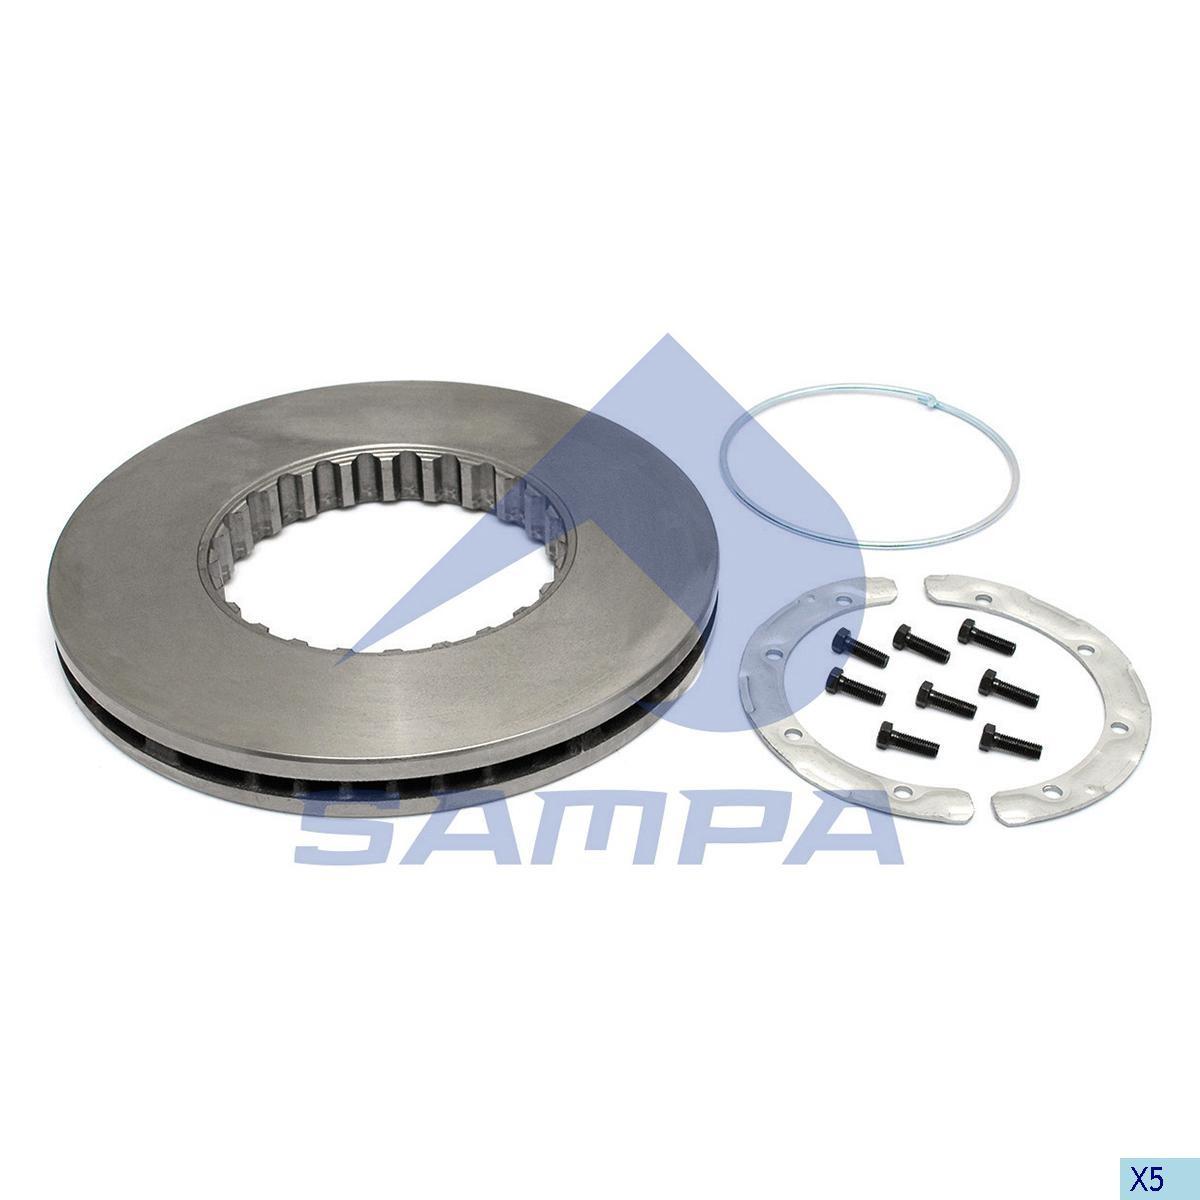 Тормозной диск VOLVO FH12,FH16 (венитилируемый) 434x45 photo